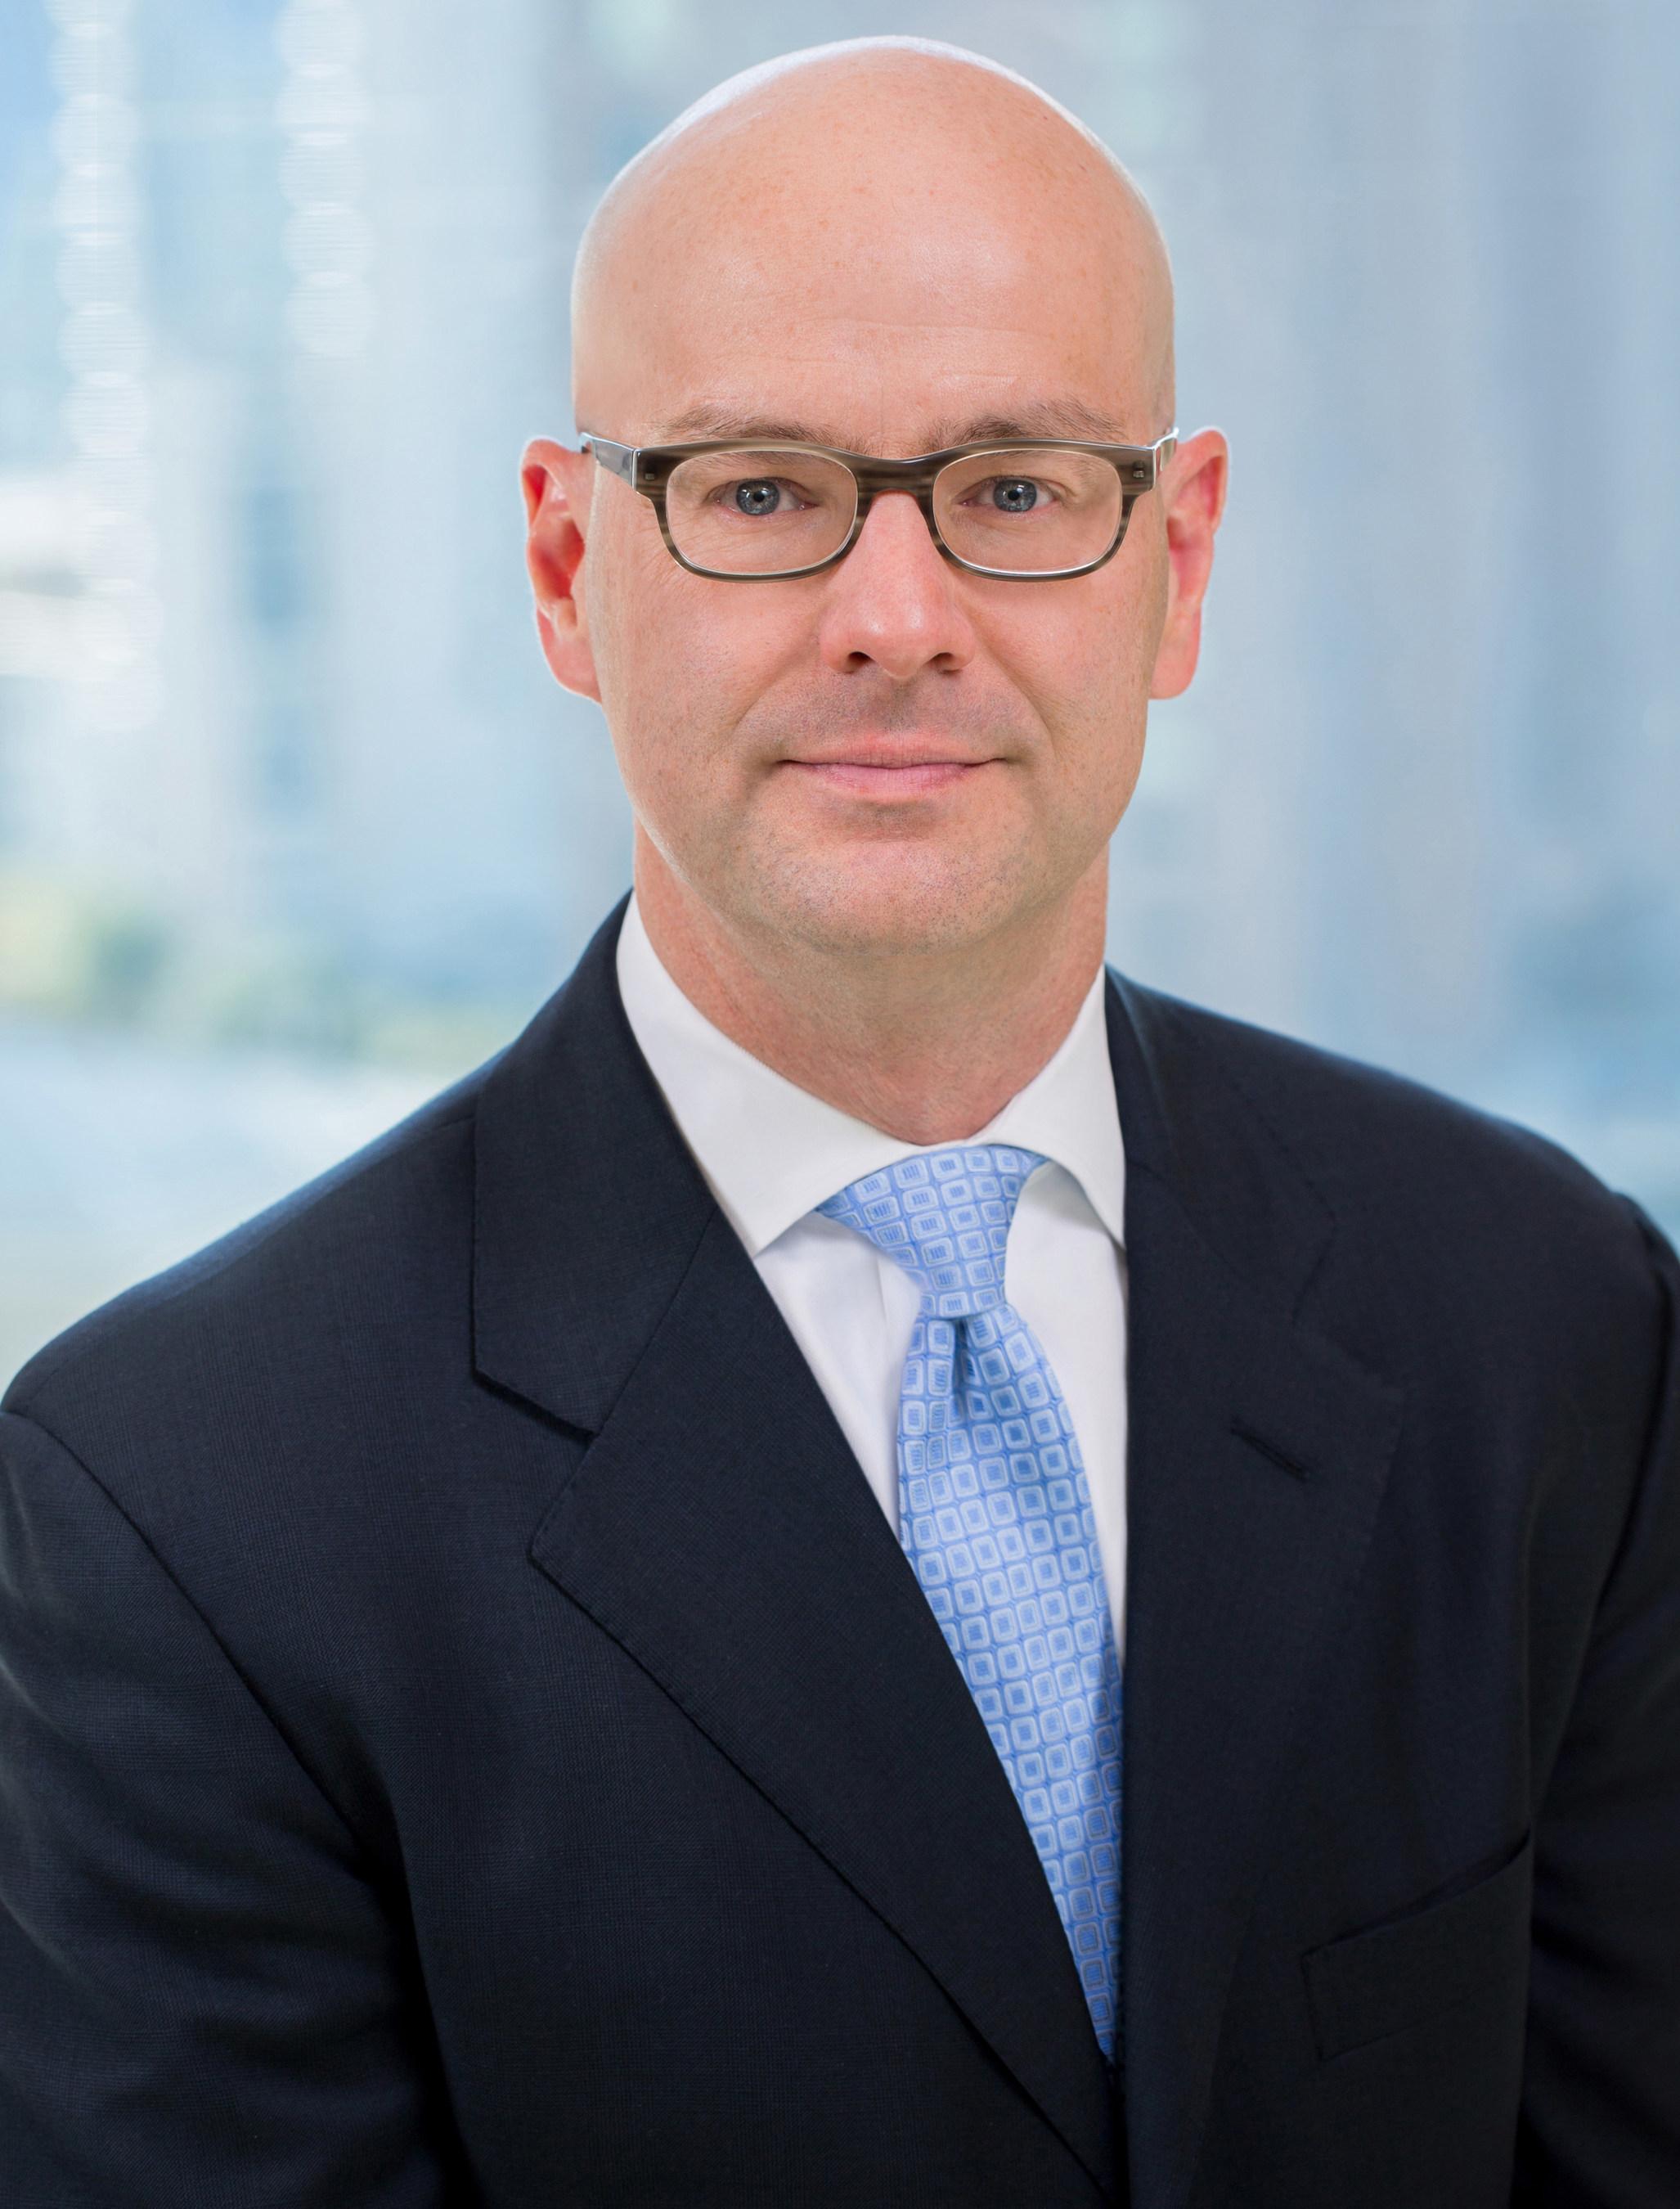 Robert Manley, Principal, McKool Smith